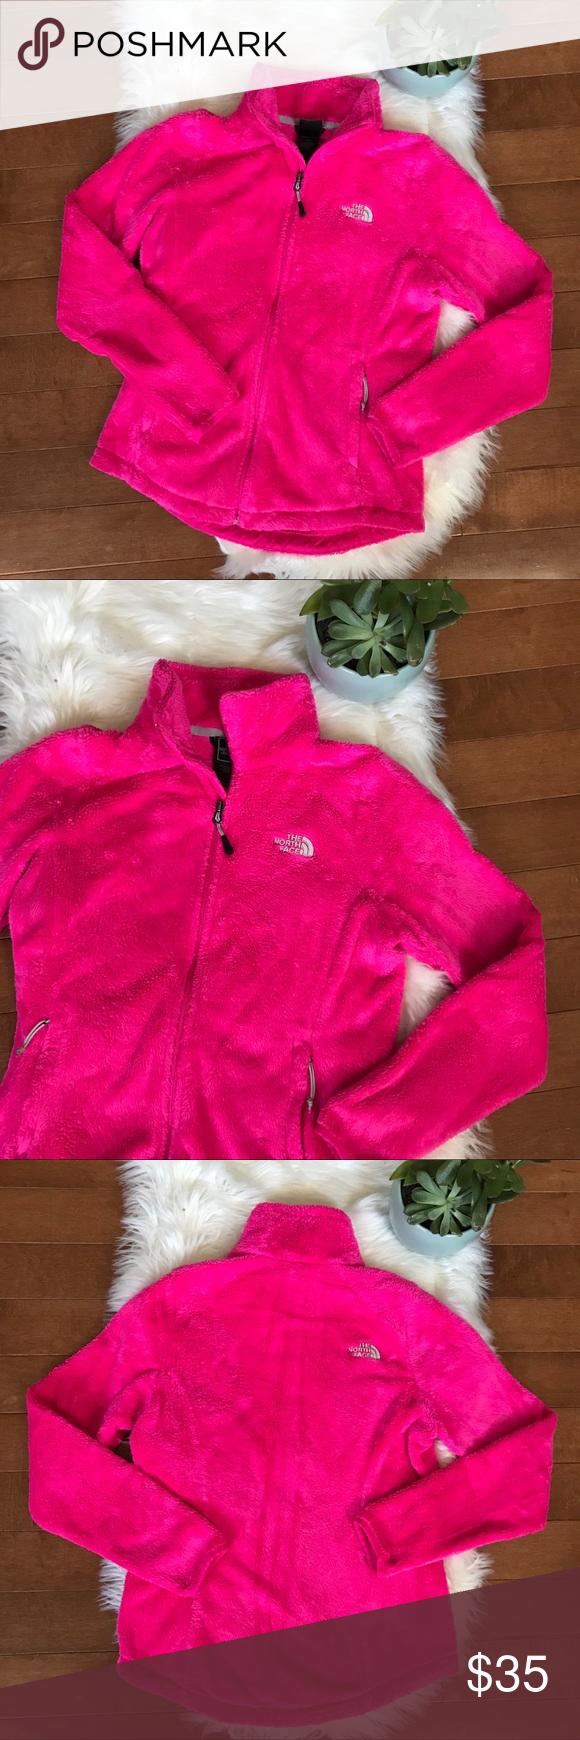 The Northface Pink Fuzzy Full Zip Jacket Sz S Zip Jackets Clothes Design Jackets [ 1740 x 580 Pixel ]